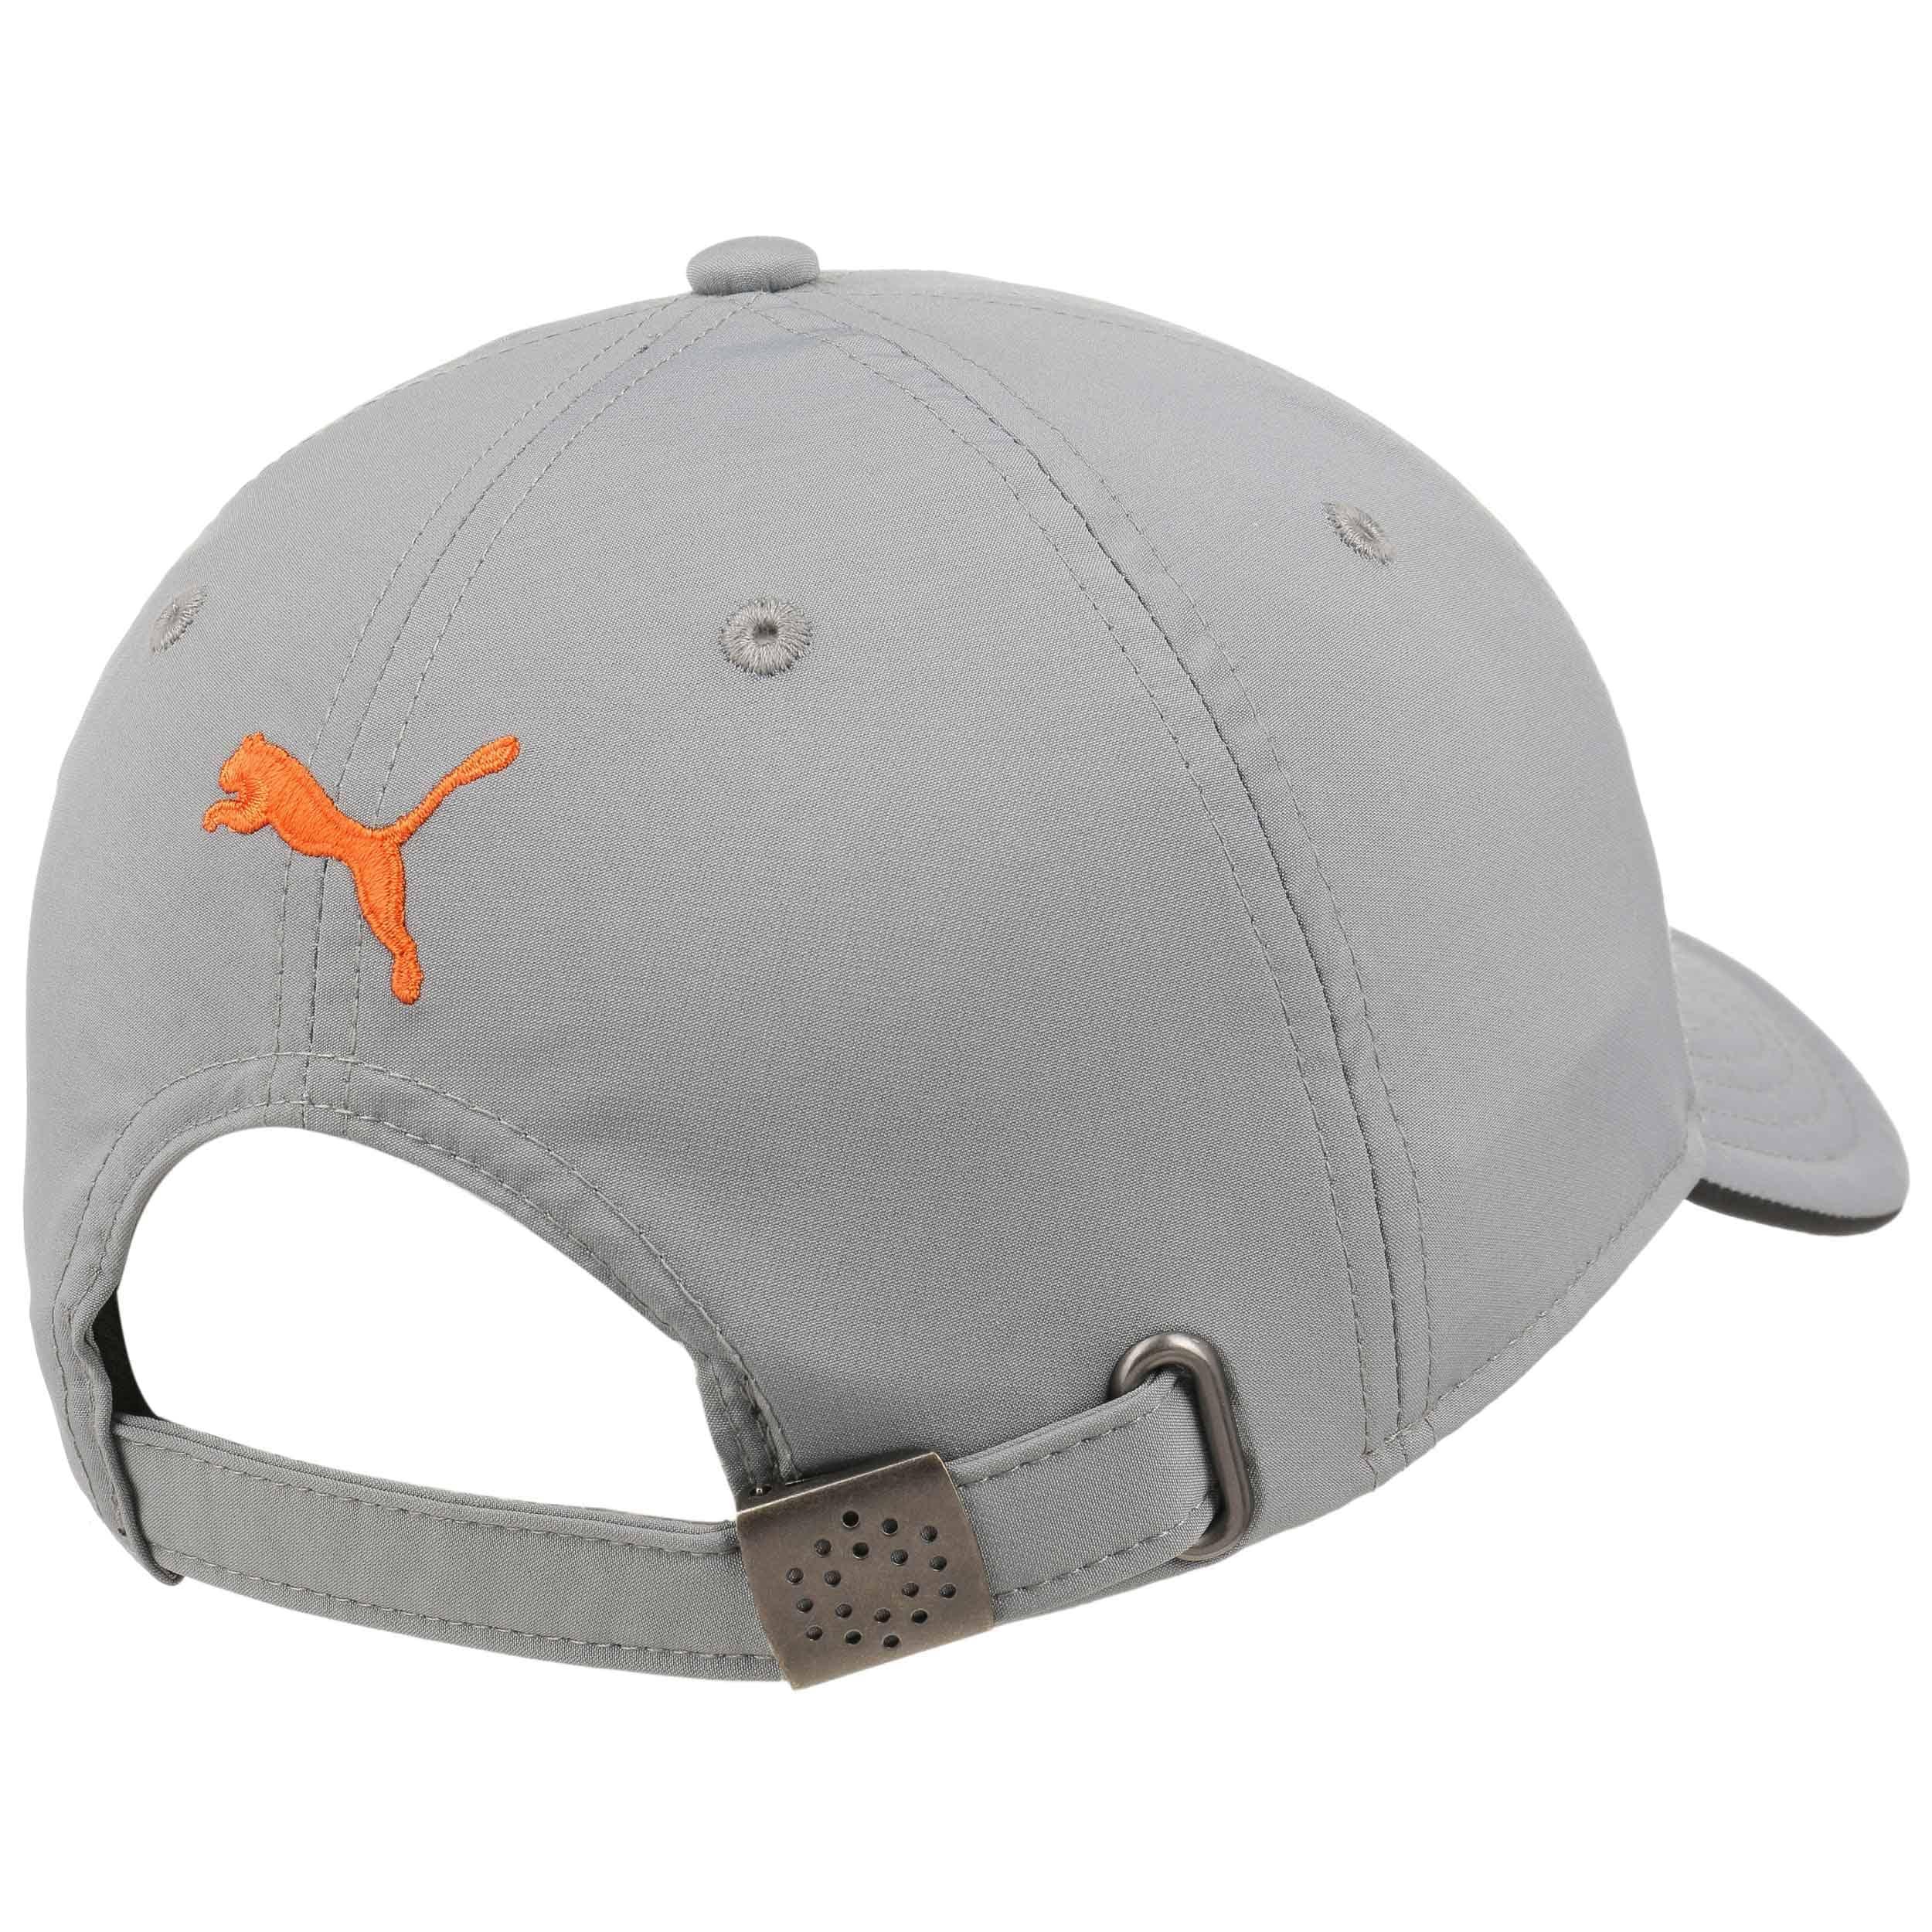 ... switzerland tech cat strapback cap by puma 3 bbce4 f37b2 official store  new orange puma cobra 110 flexfit tech sample hat prototype ... 37c1c9d2ead2